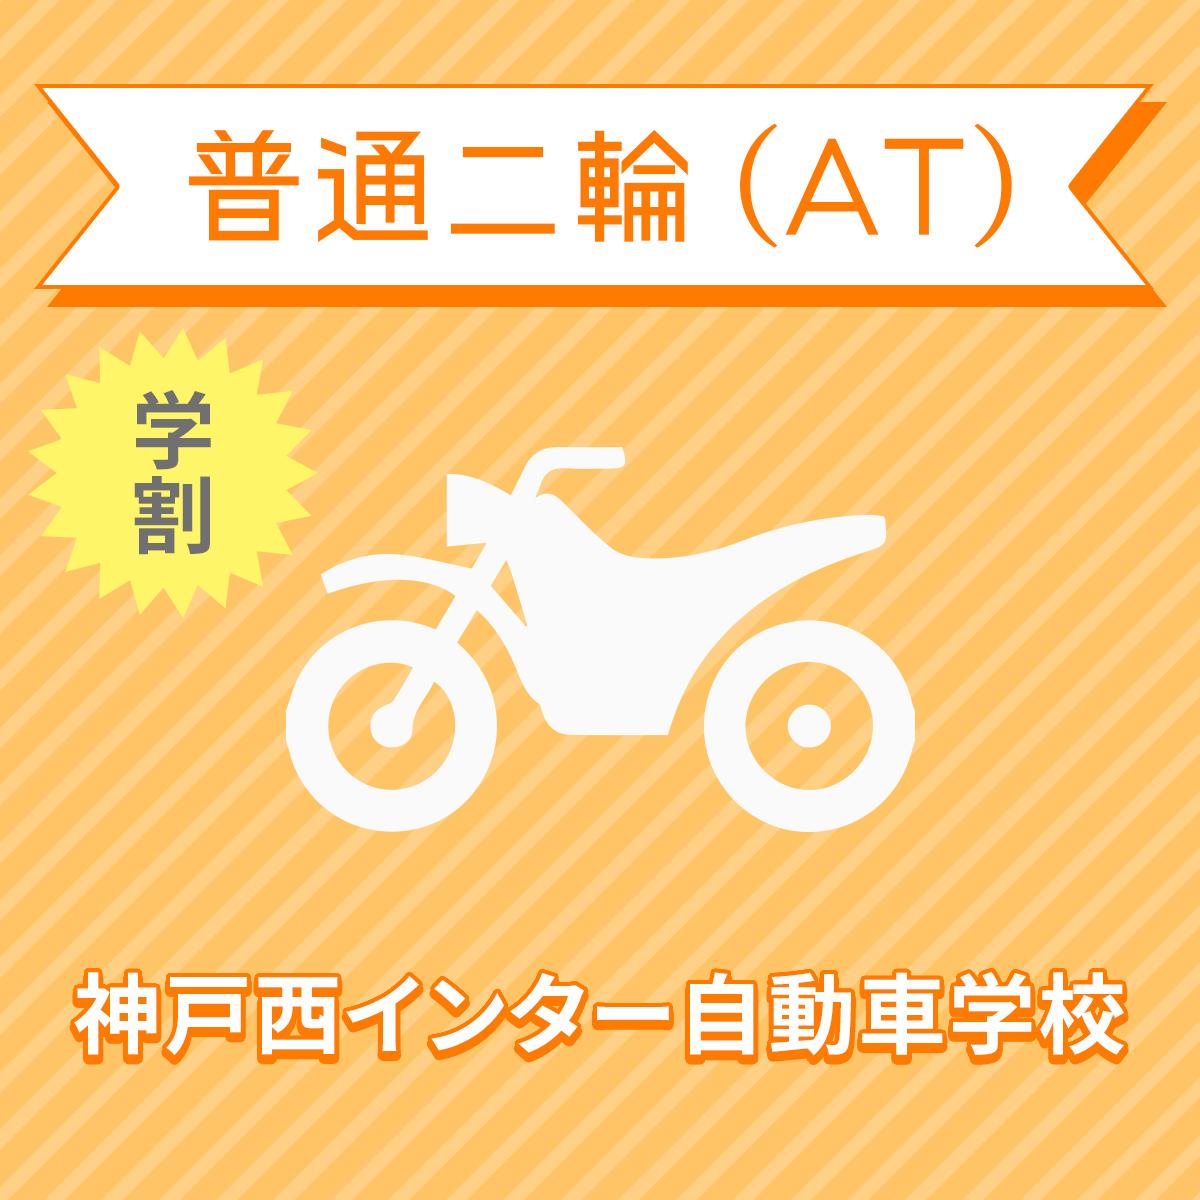 【兵庫県神戸市】普通二輪ATコース(学生料金)<免許なし/原付免許所持対象>